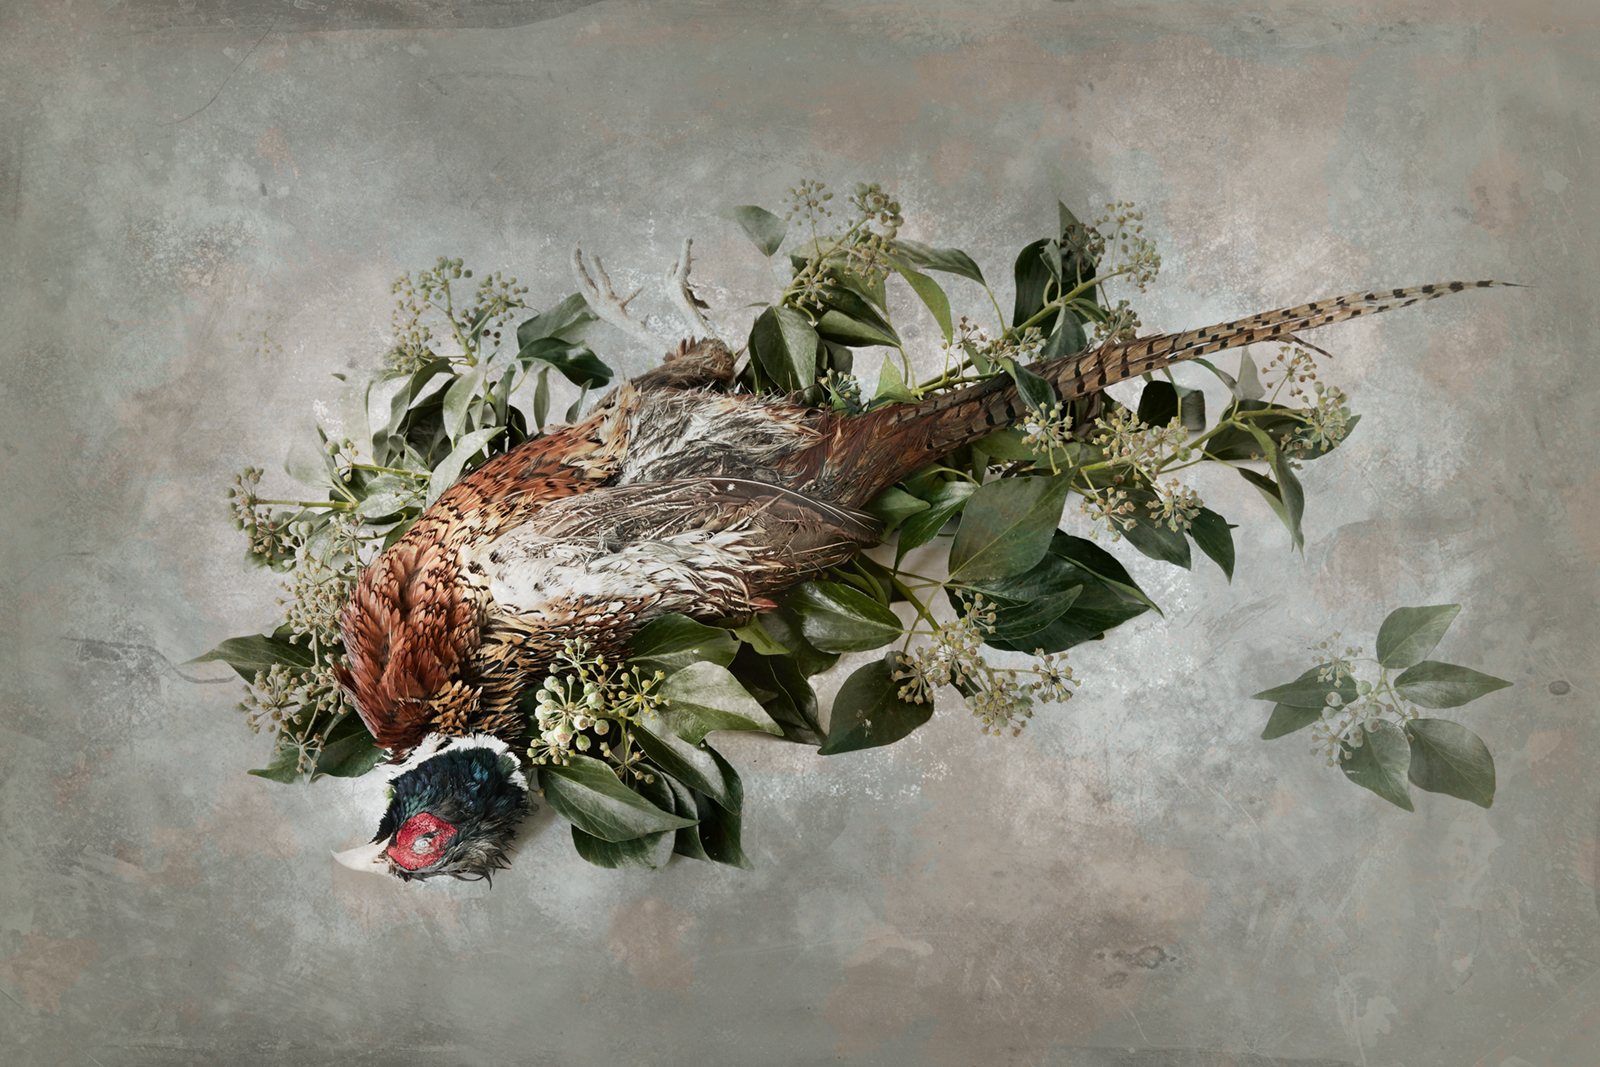 Peter M. Madsen: Pheasant memento mori © Peter M. Madsen